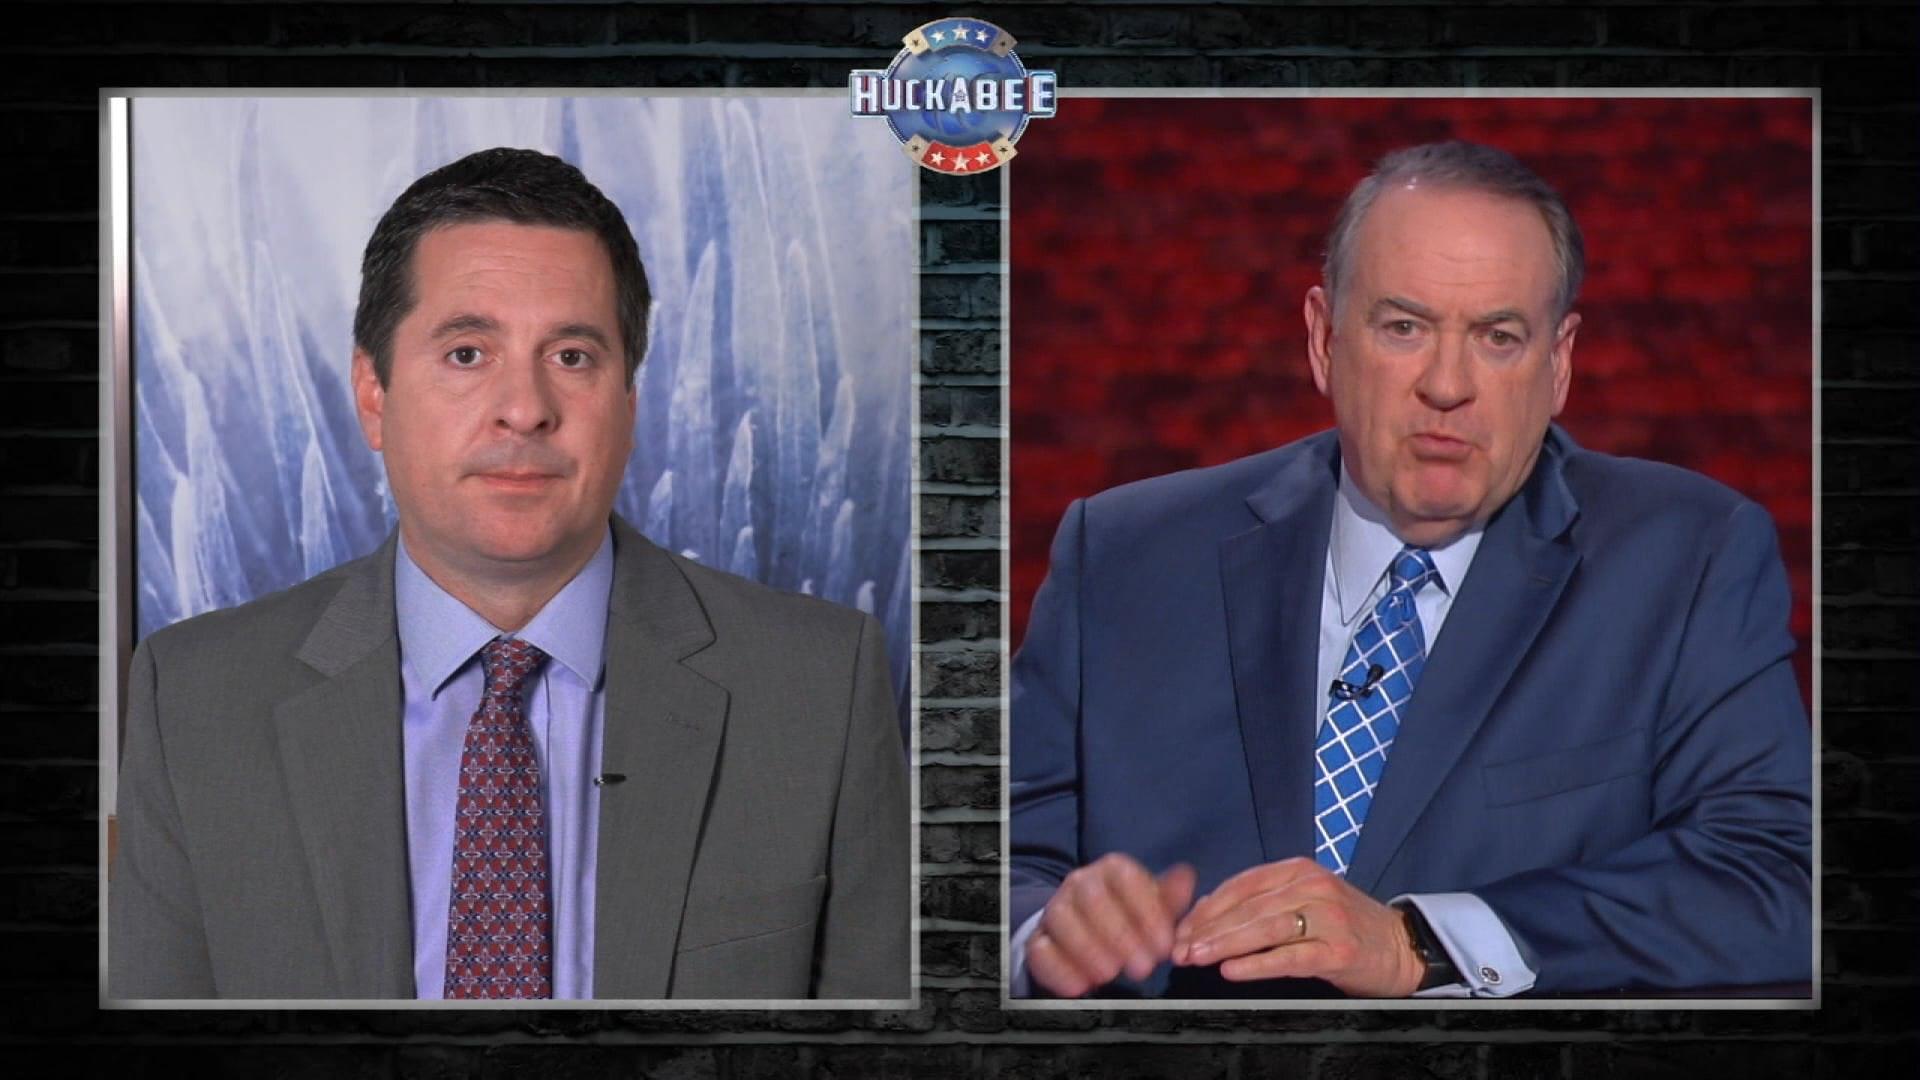 Watch Huckabee | April 20, 2019